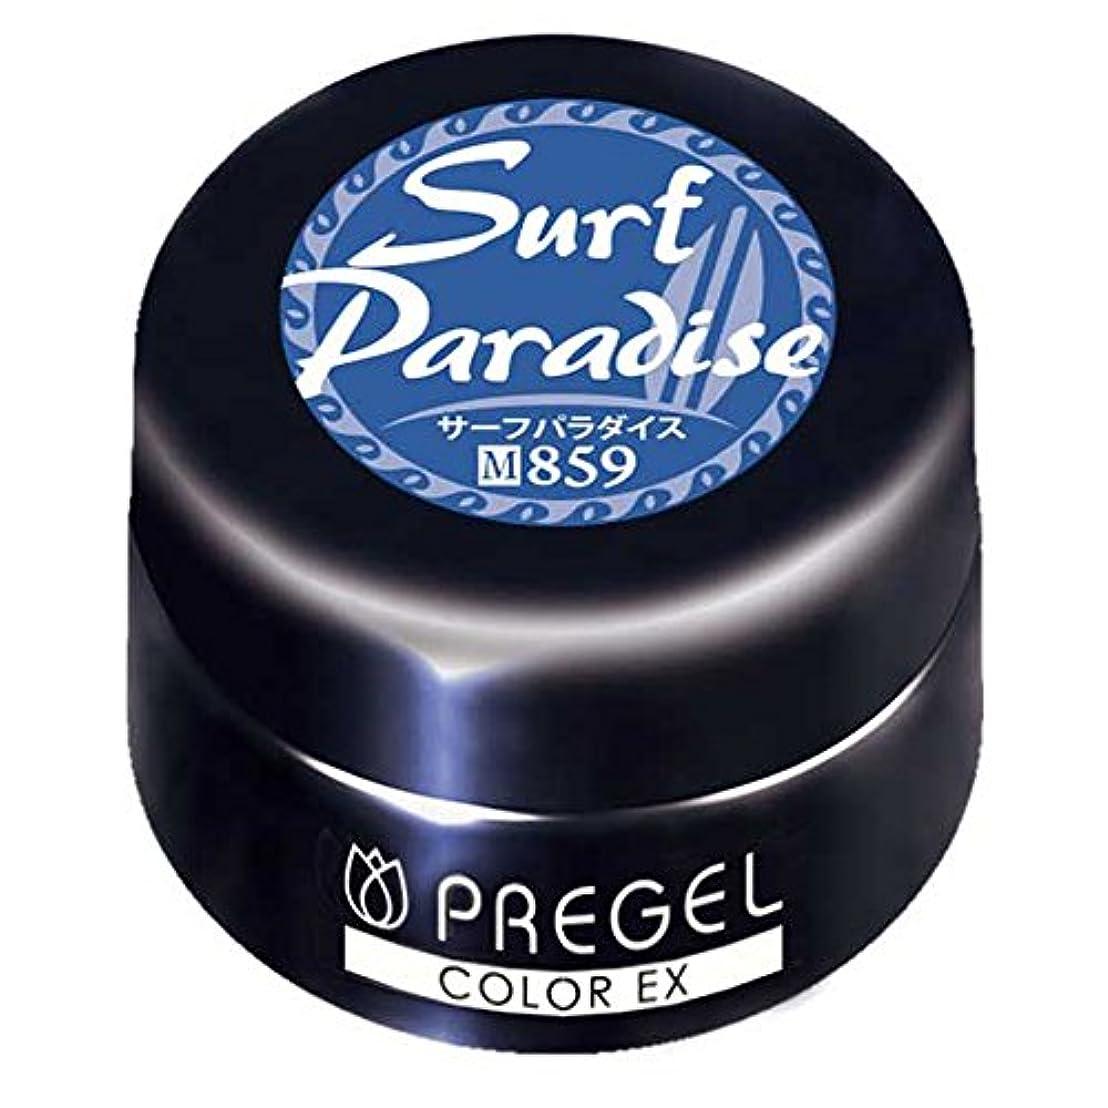 PRE GEL カラーEX サーフパラダイス 859 3g UV/LED対応